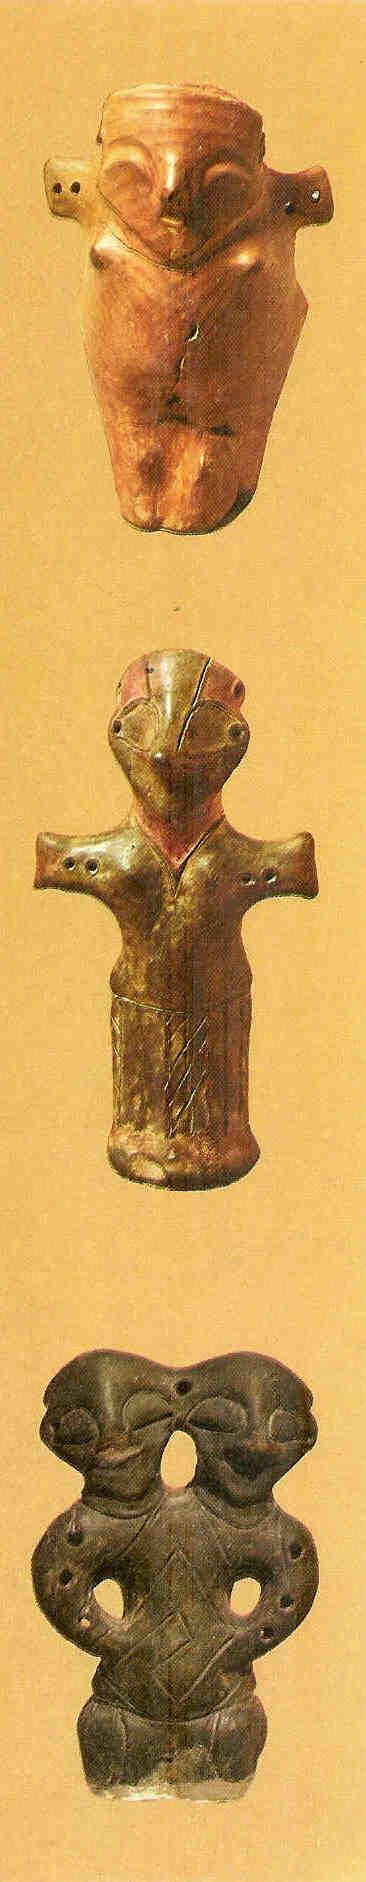 Godinnen met vogelgezicht. Vinca. 5000 v. Chr.